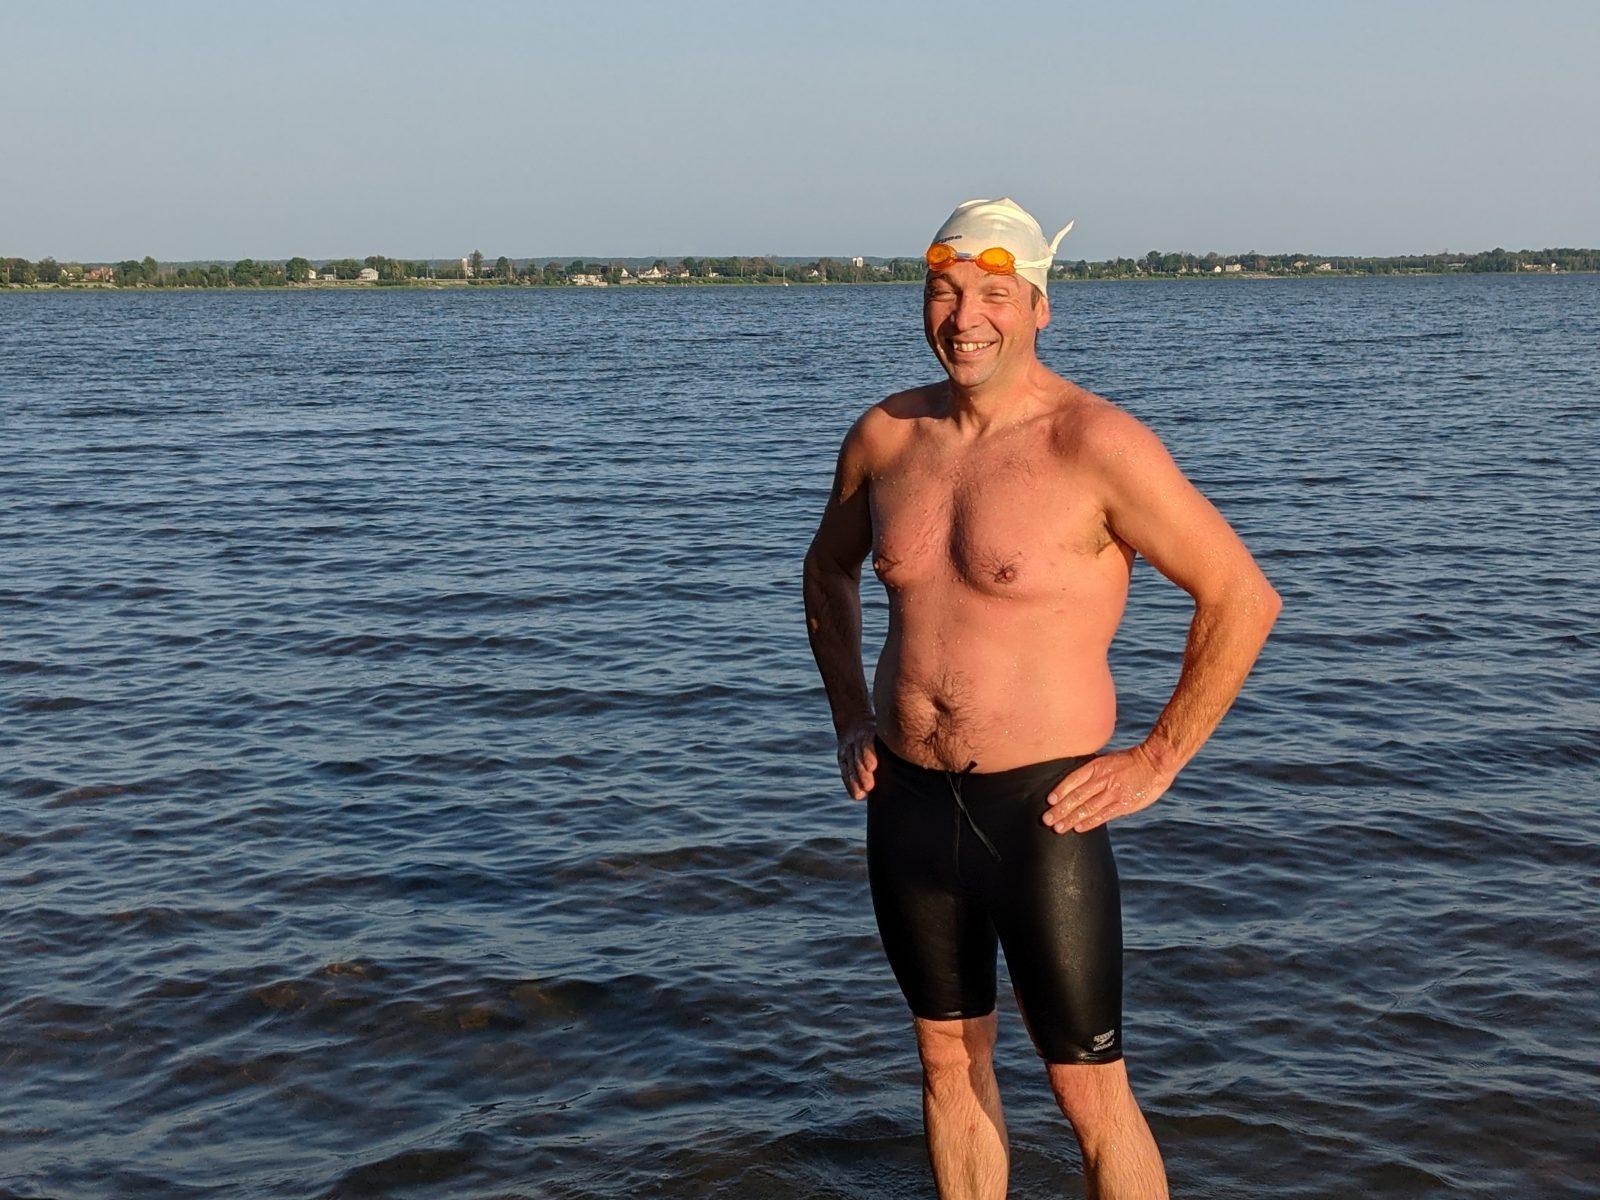 Traversée Internationale du lac Saint-Jean: Alexandre Harvey tentera sa chance